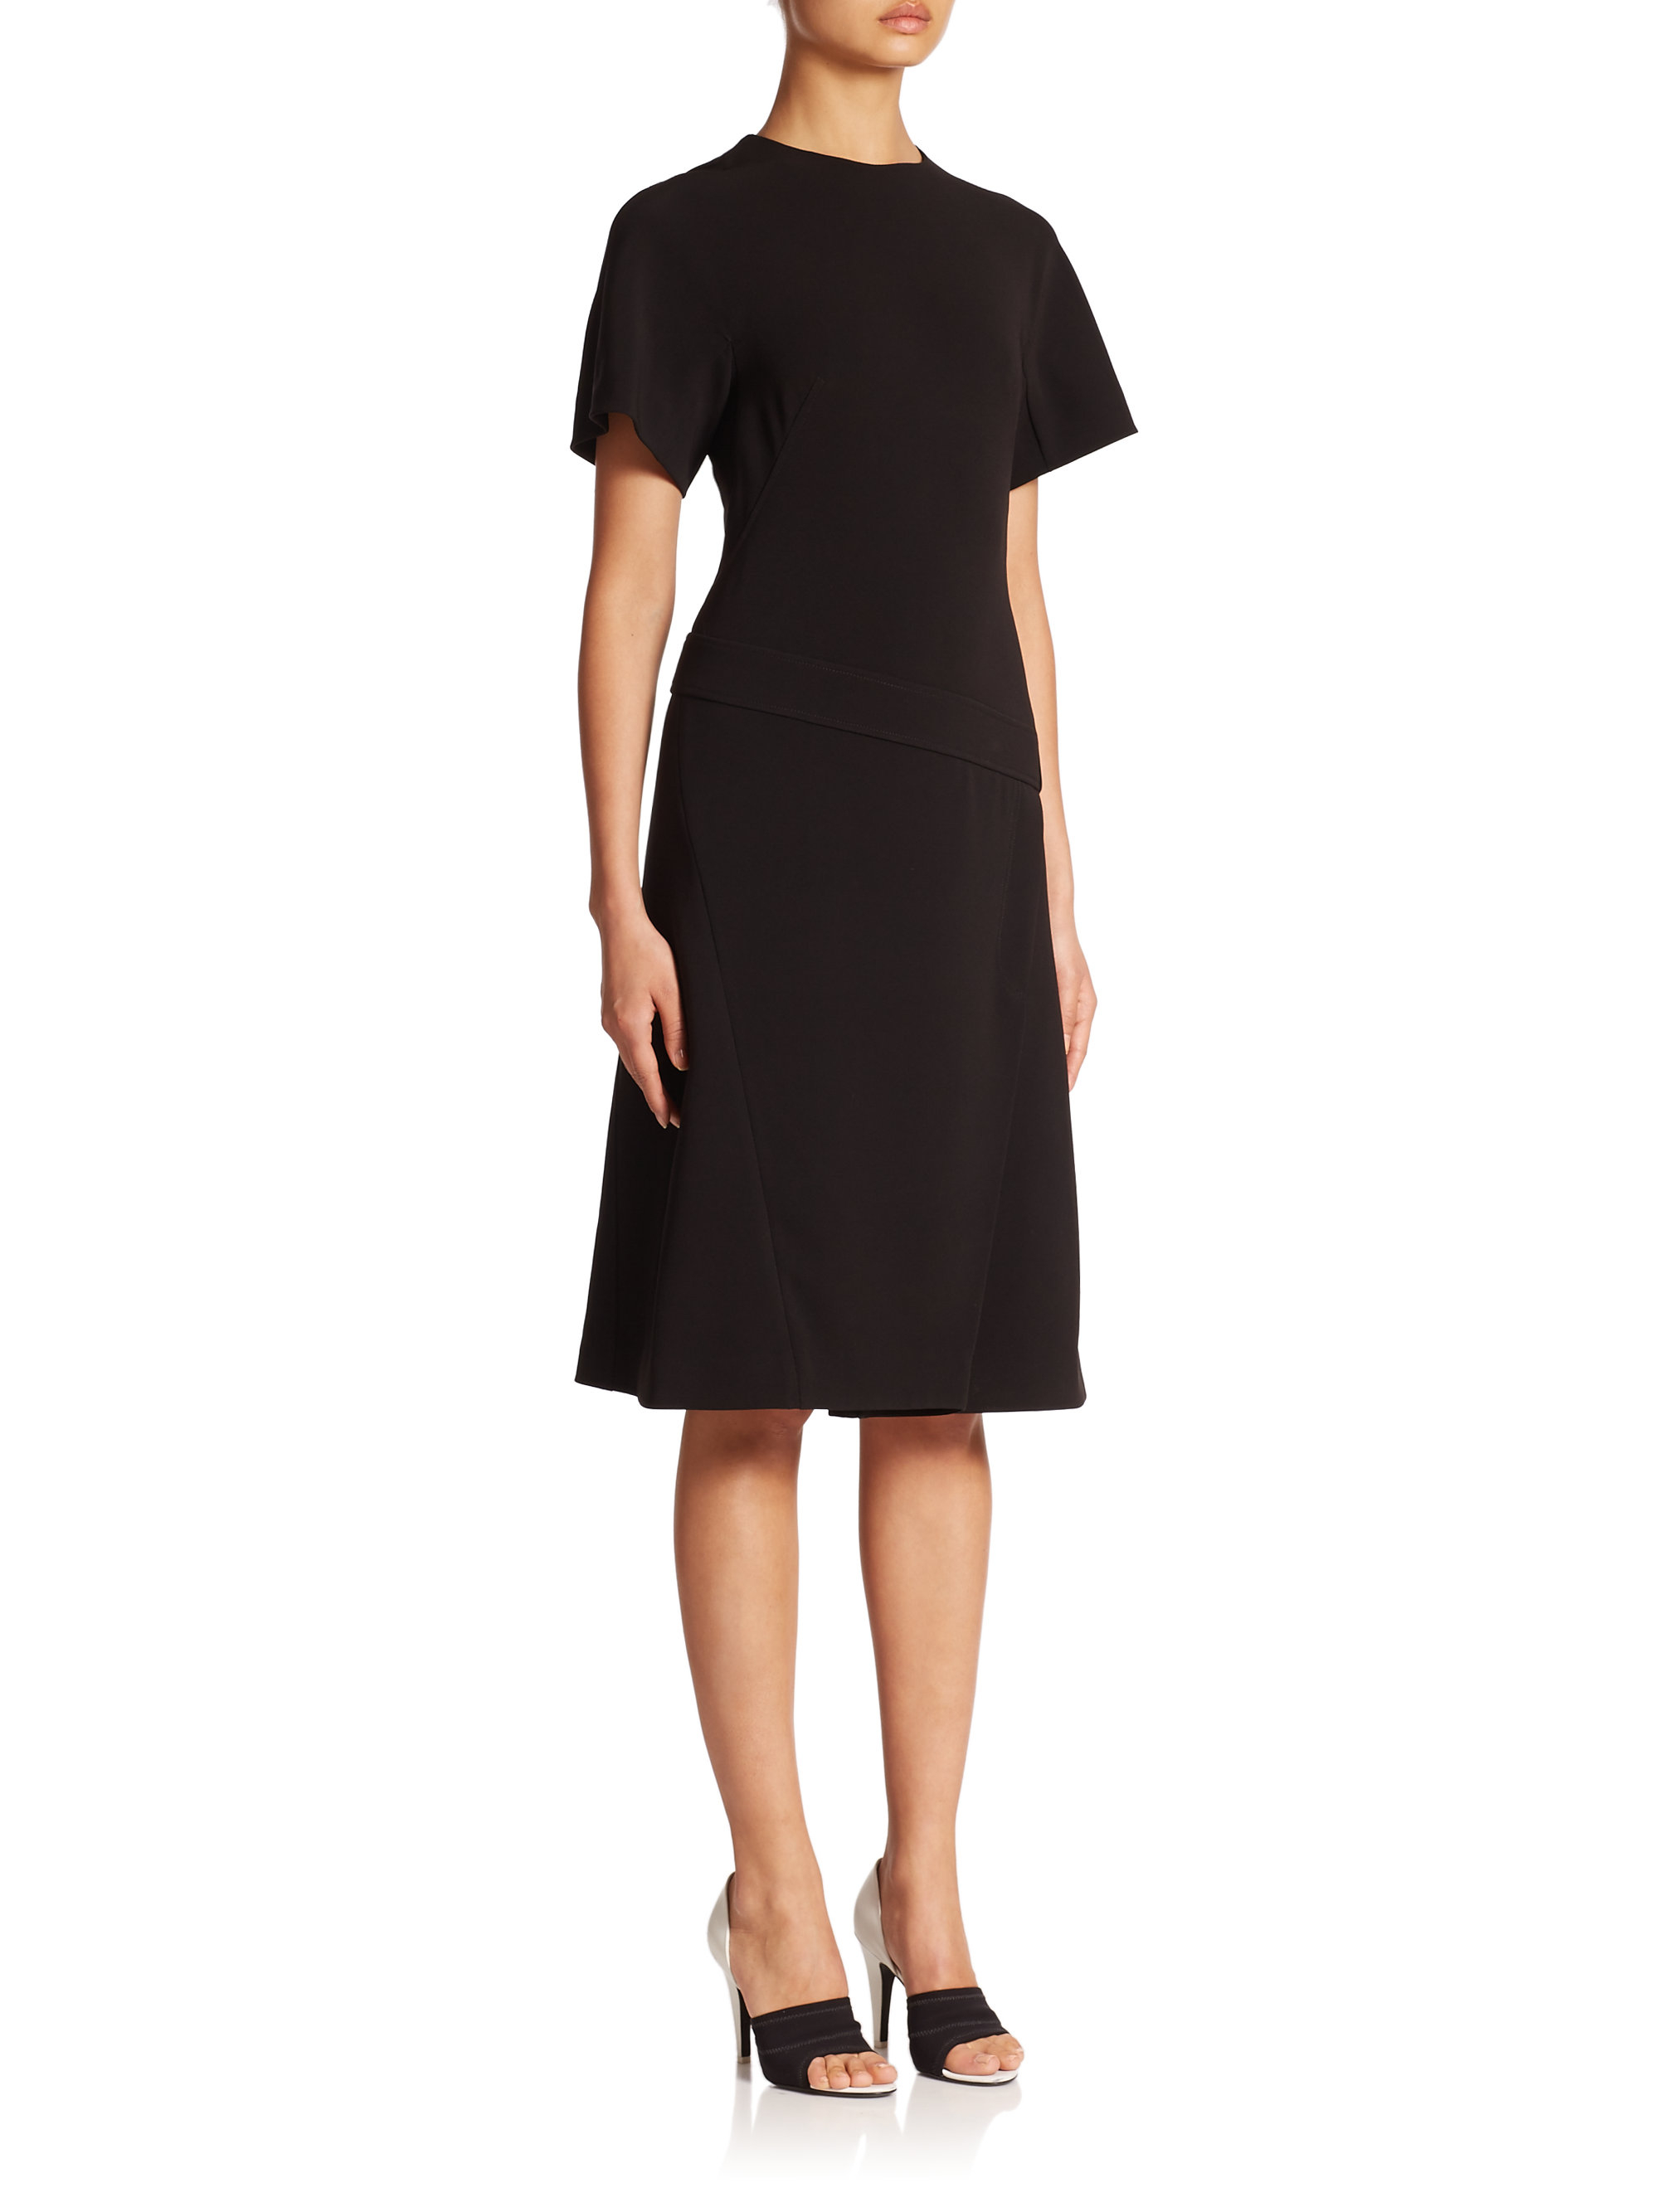 Lyst alexander wang pleated t shirt dress in black for Black pleated dress shirt